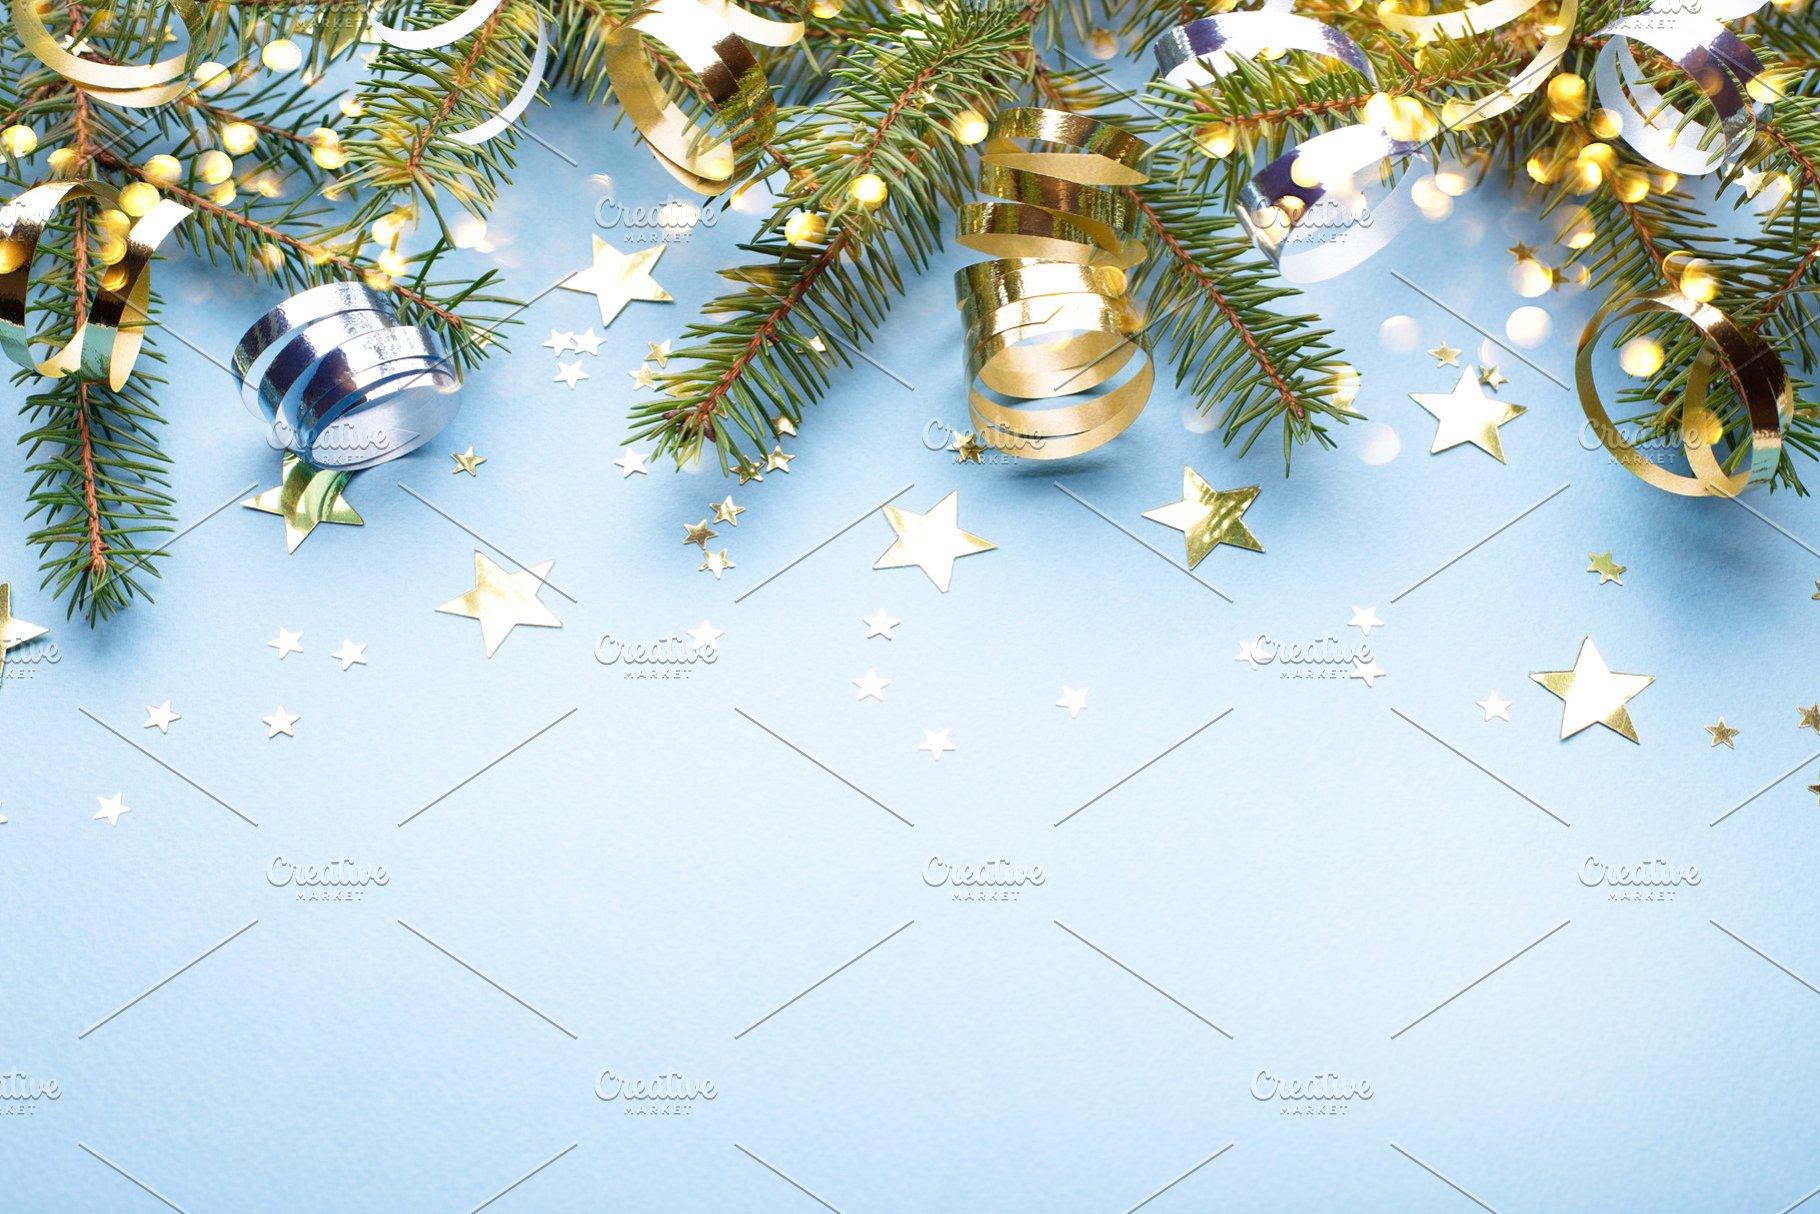 Christmas Frame.Christmas Frame With Fir Branches